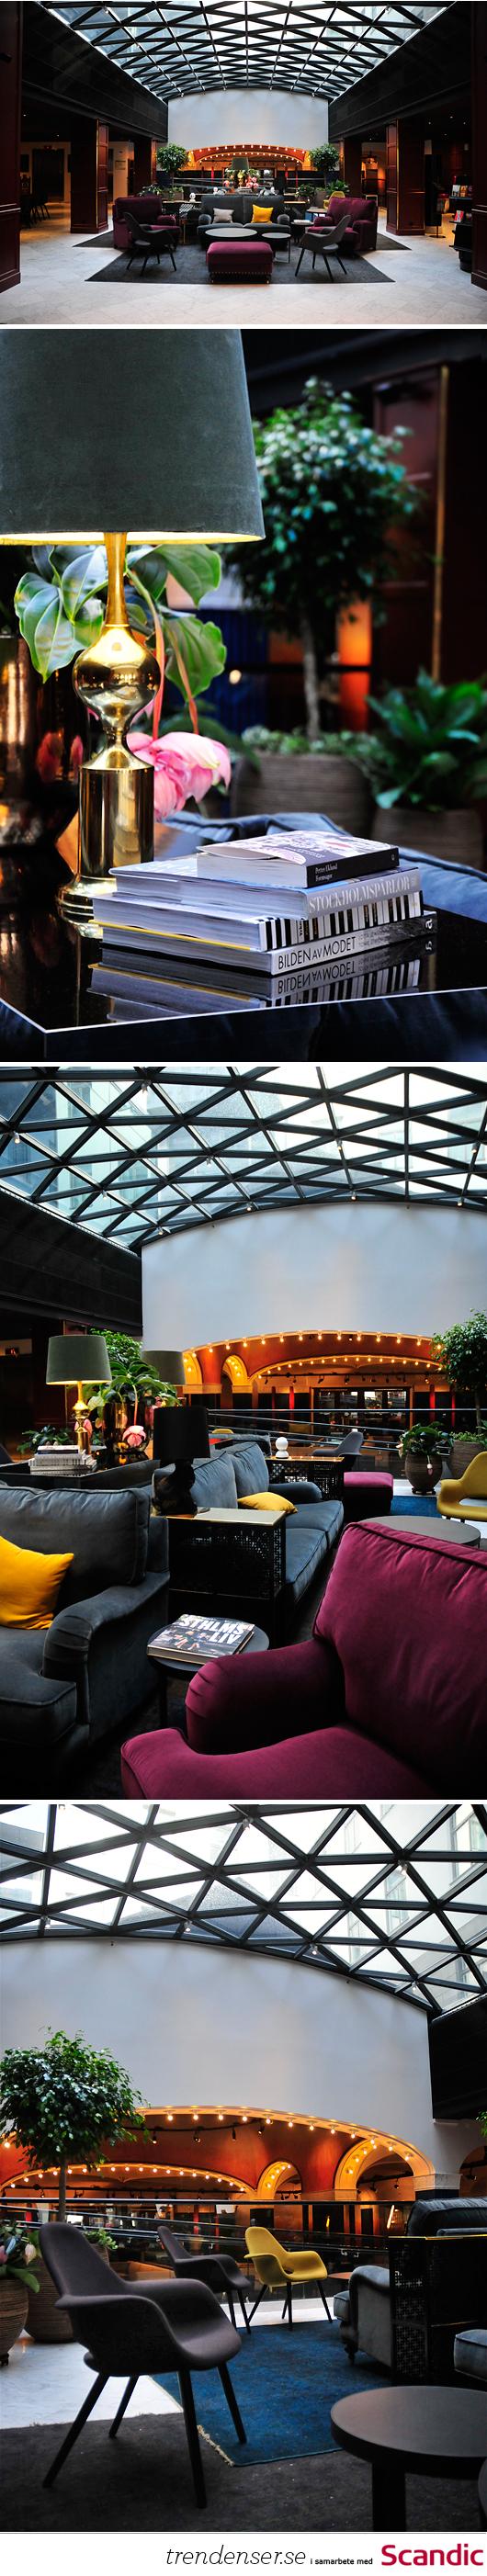 Scandic Grand Central nytt hotell stockholm designhotell pressvisning